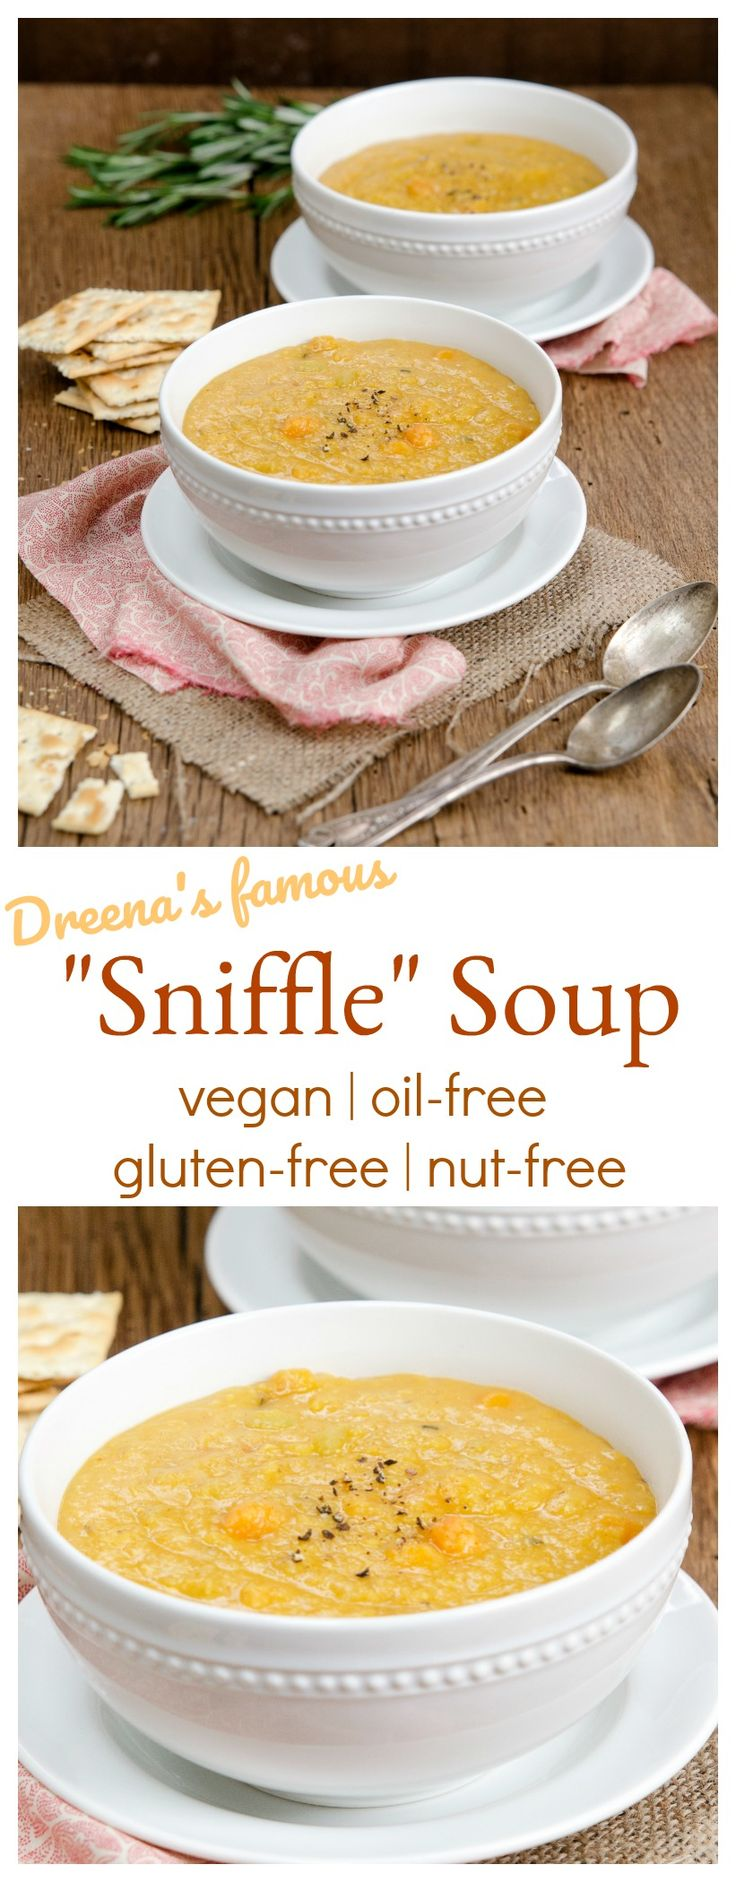 "Dreena's FAMOUS Mellow Lentil ""Sniffle"" Soup. Make it now, love it forever! #vegan #soup #recipe #oilfree #wfpb #plantbased #soups #lentils #nutfree #soyfree #glutenfree #easy"